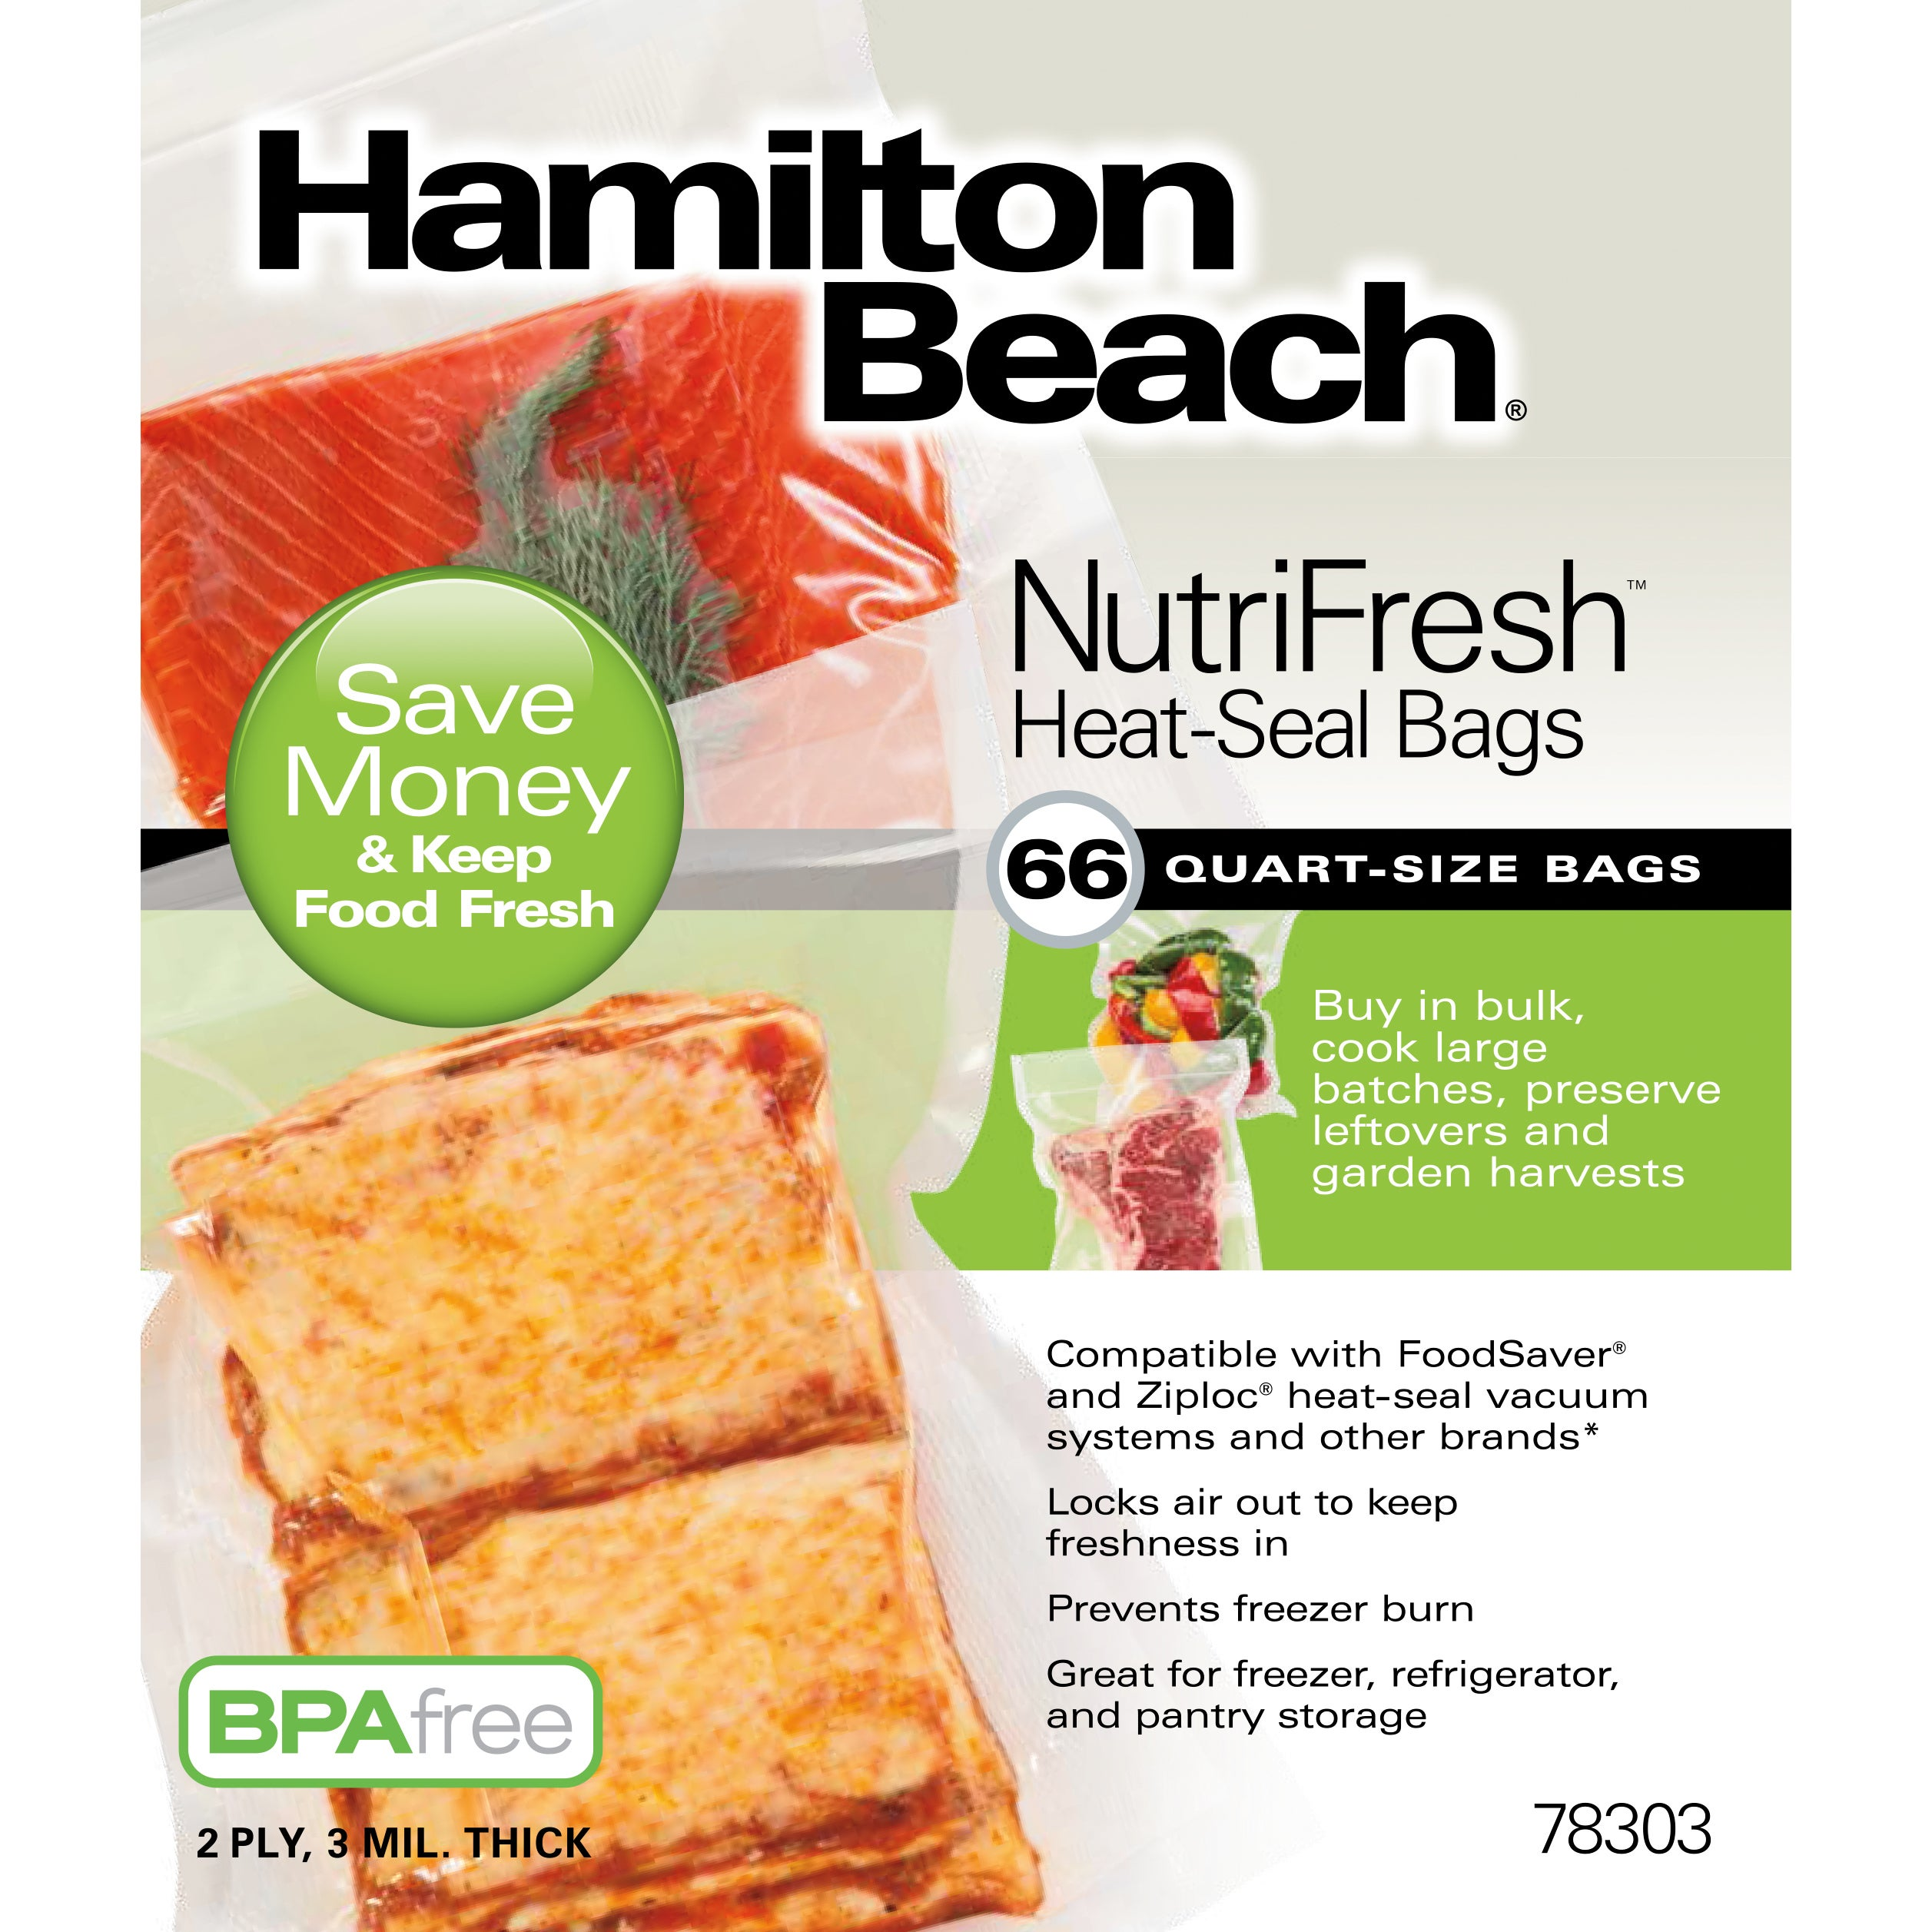 Hamilton Beach NutriFresh 66 ct. Heat-Seal Bags (Hamilton...